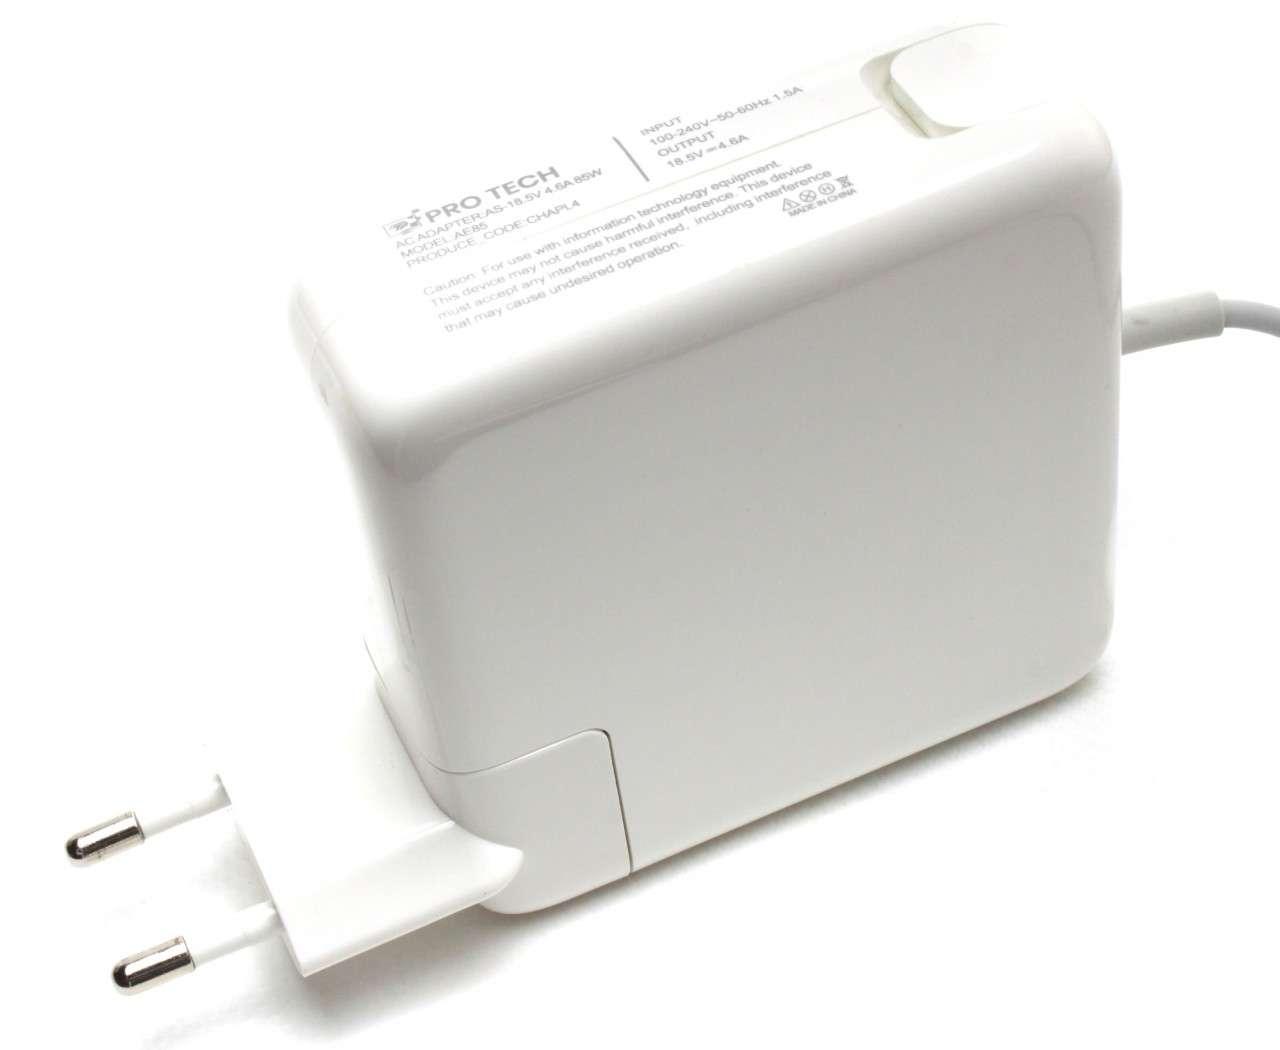 Incarcator Apple MacBook Pro 15 inch Late 2011 85W Replacement imagine powerlaptop.ro 2021